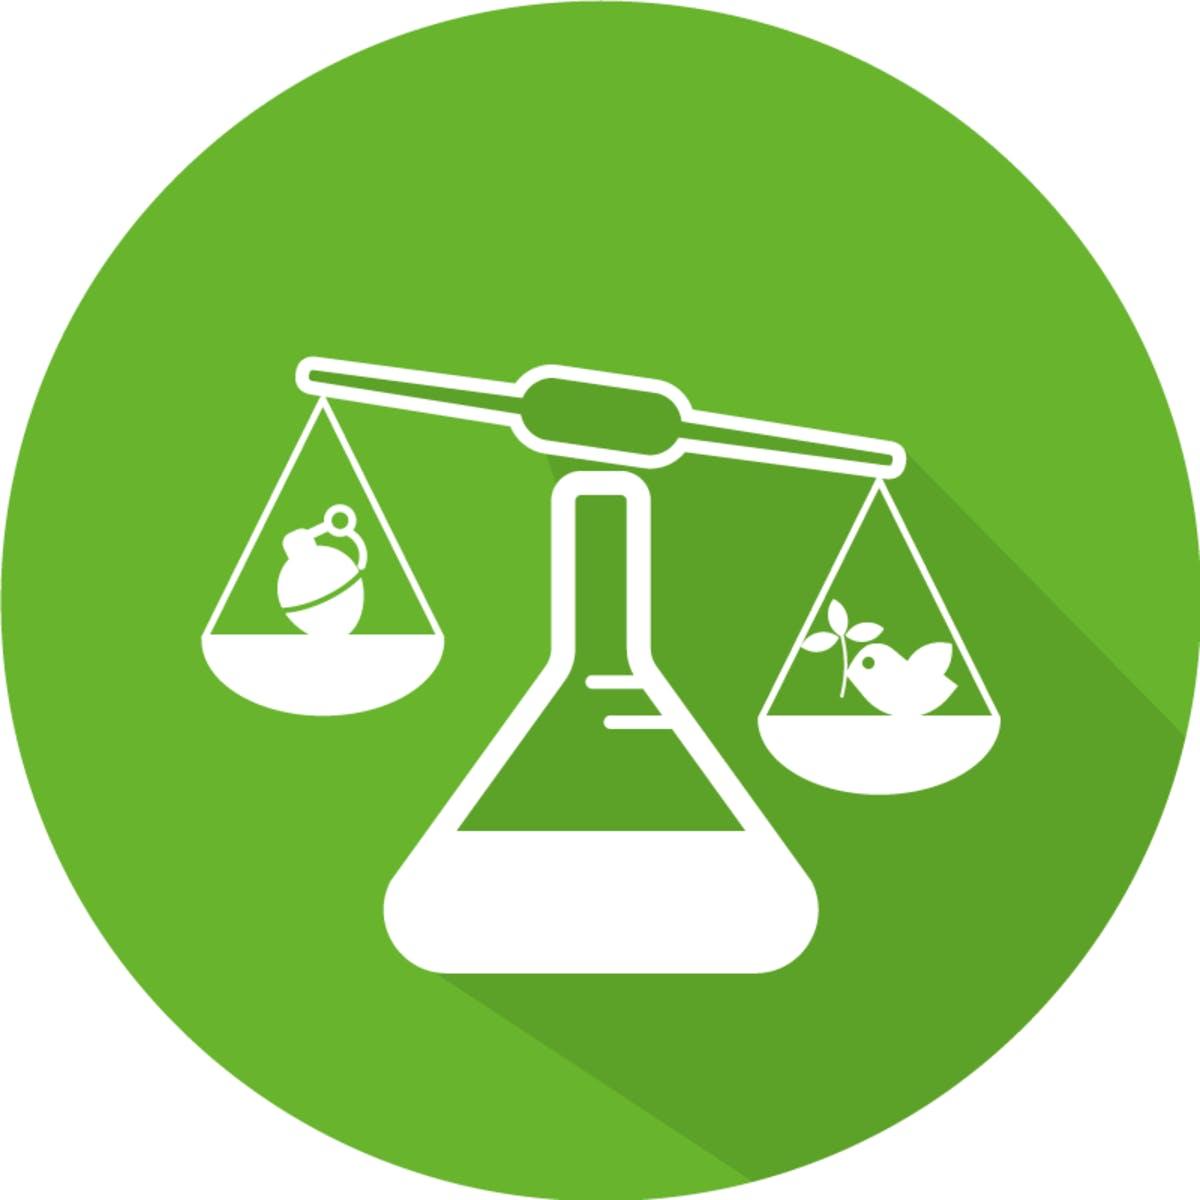 Química, guerra y ética